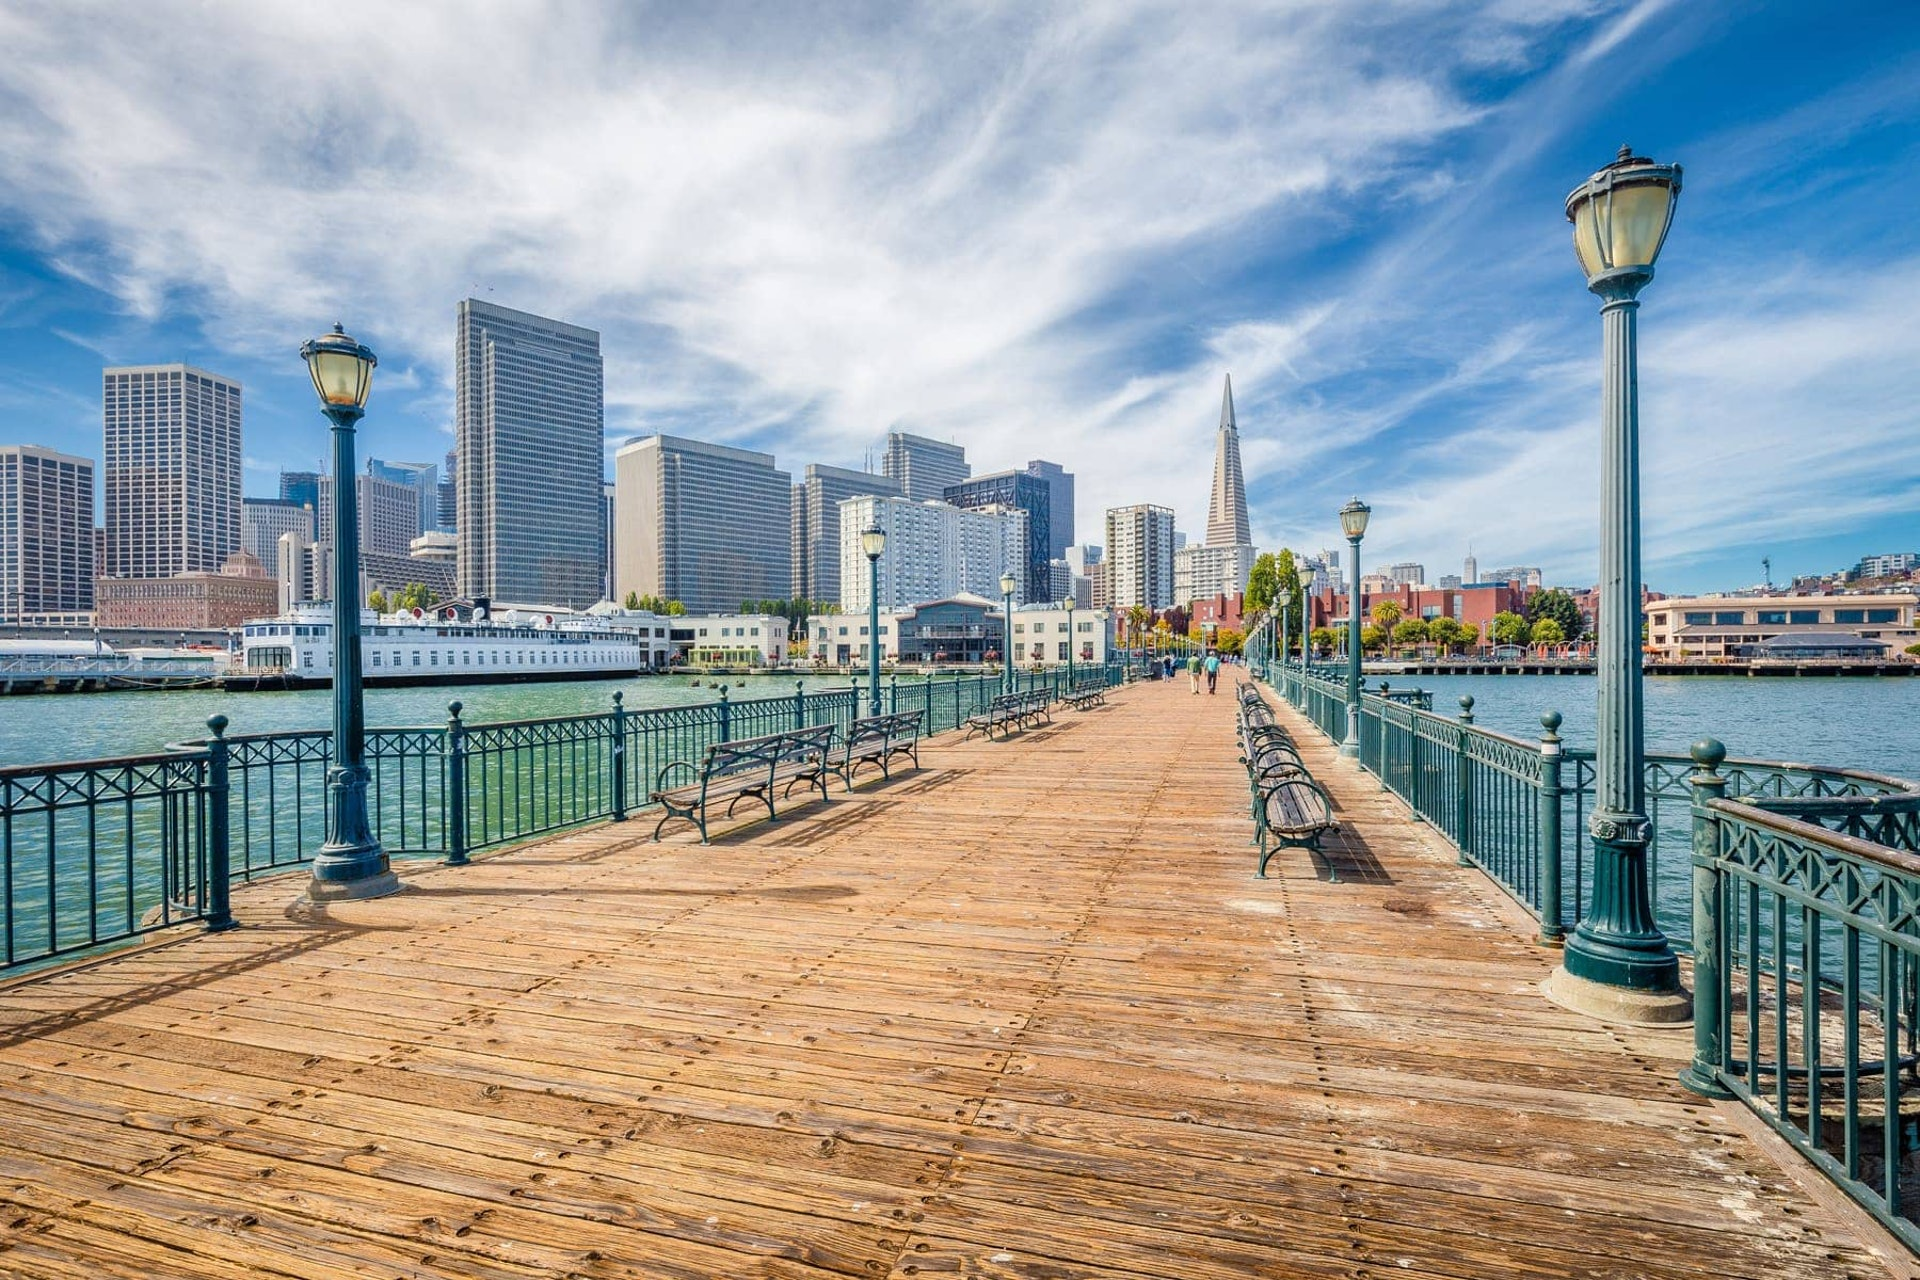 San Francisco Pier on a sunny day, California